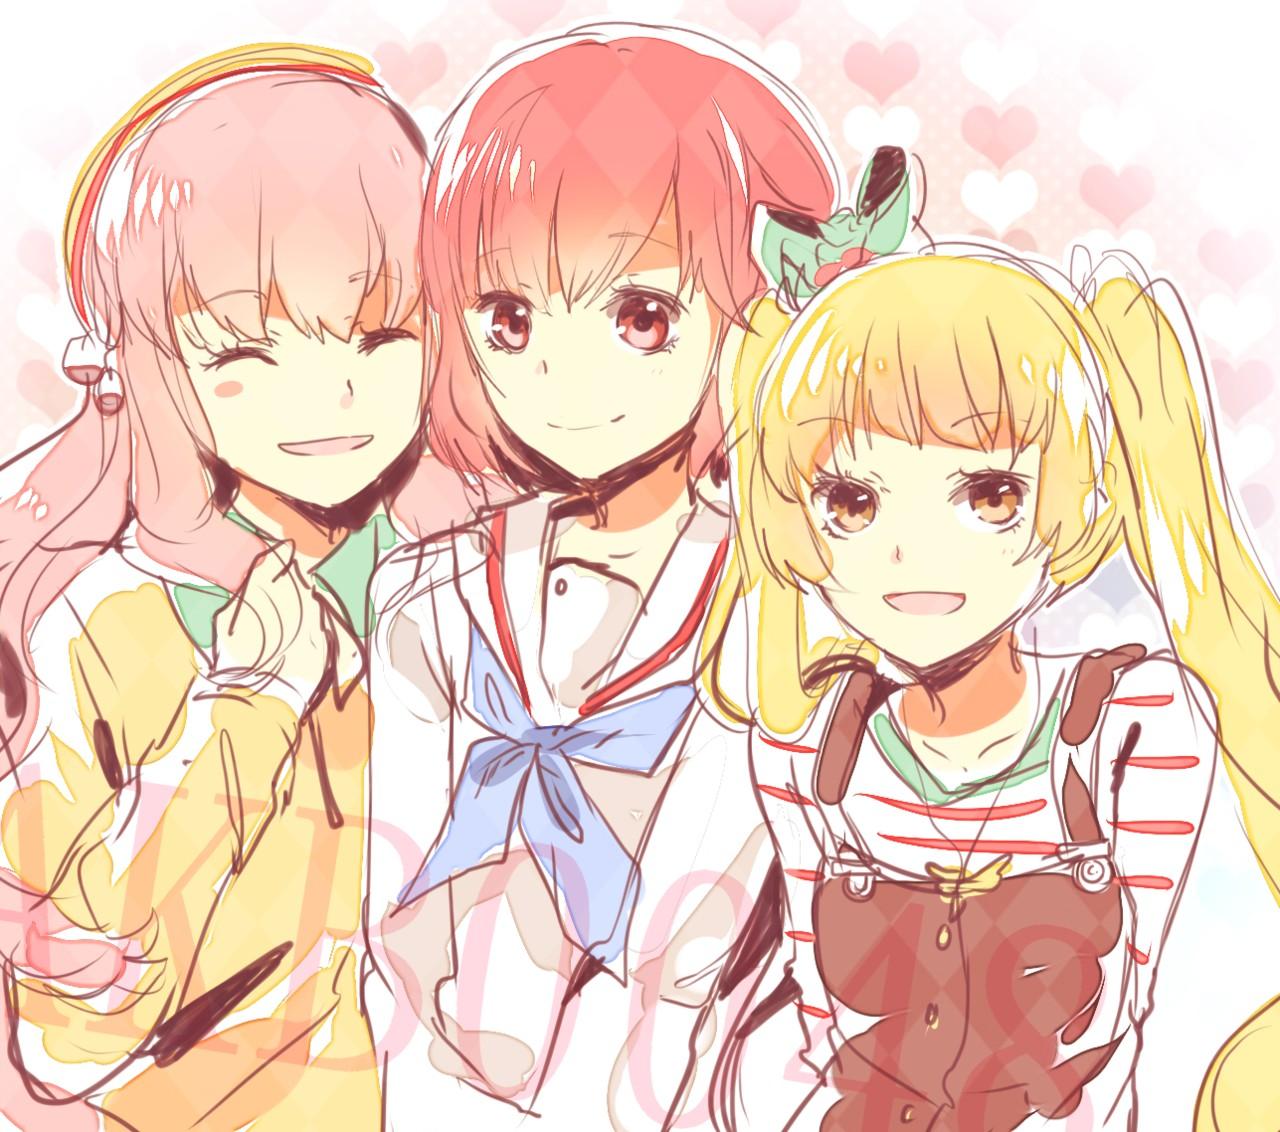 Ichijou Yuuka Akb0048 Zerochan Anime Image Board